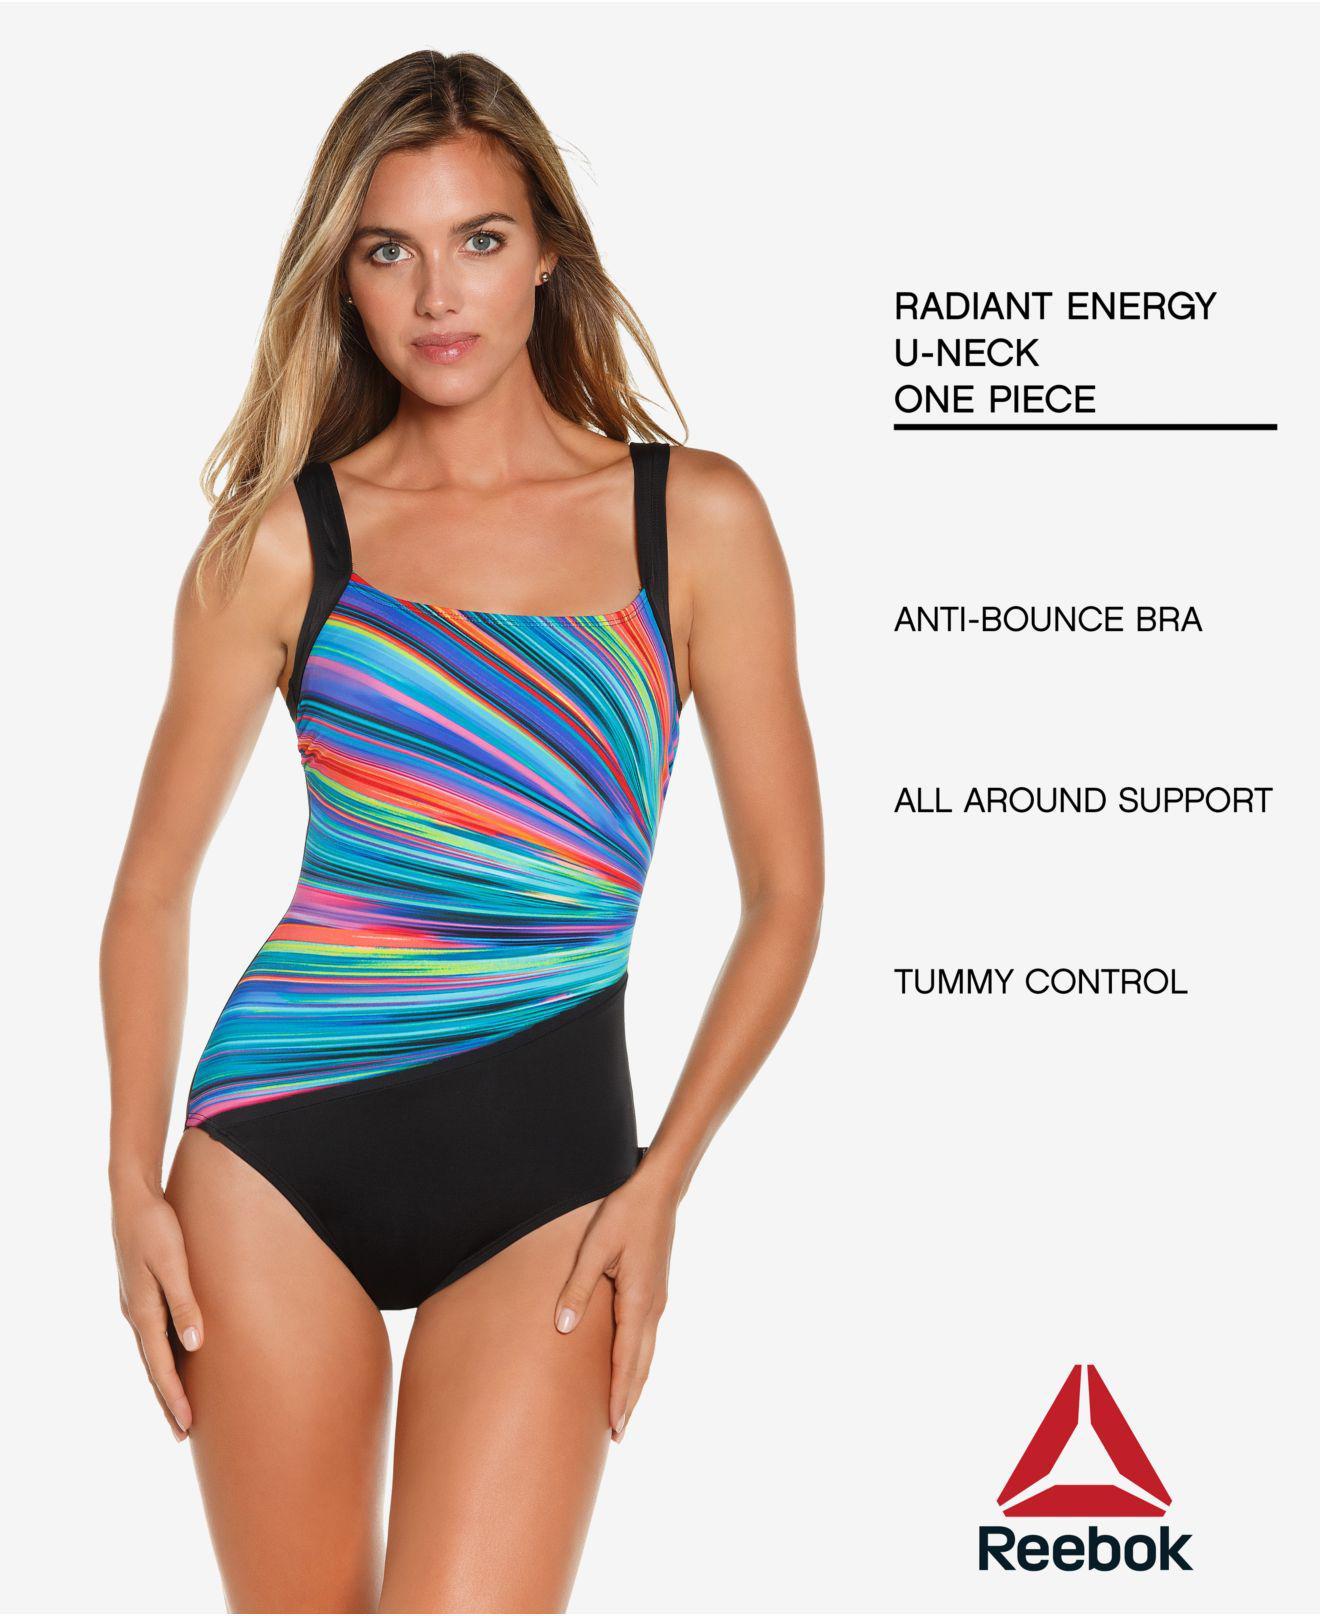 4c80bebc1b Reebok Radiant Energy Printed Tummy-control One-piece Swimsuit - Lyst